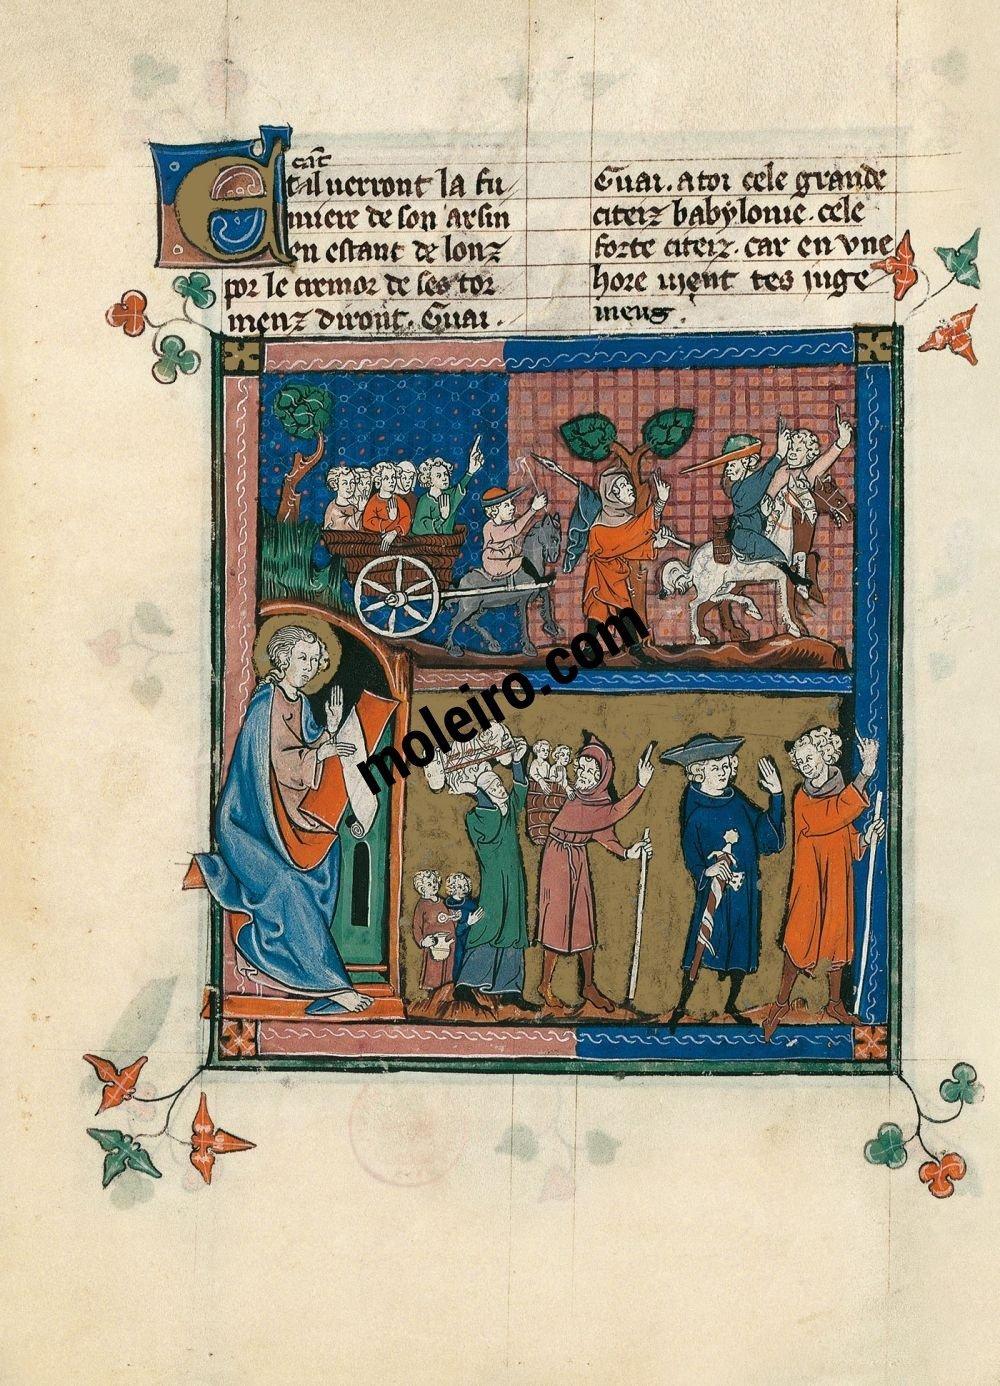 The Apocalypse of 1313 f. 60v, Babylon abandoned (Ap. 18, 4-9a)